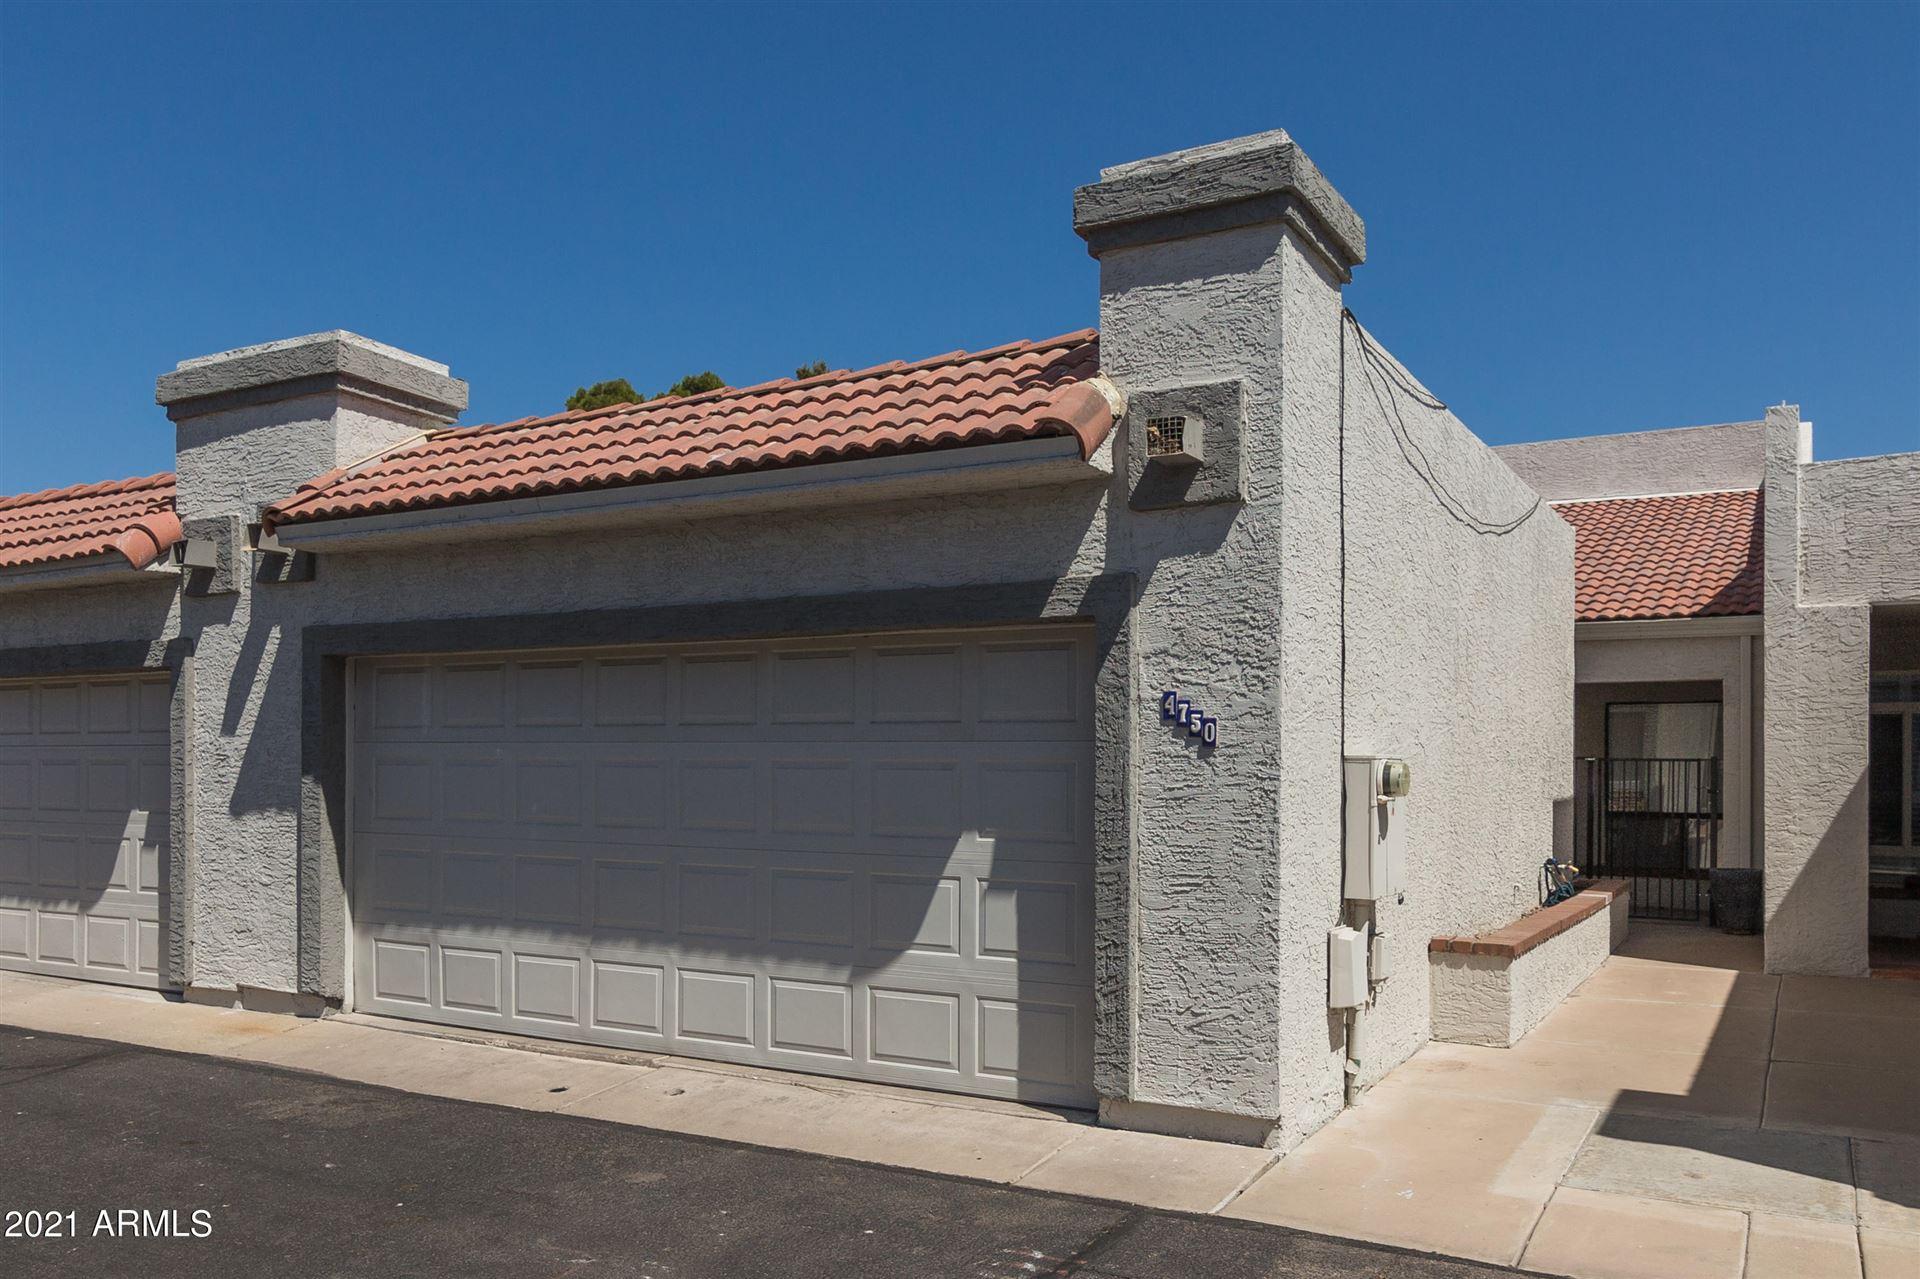 4750 W SANNA Street, Glendale, AZ 85302 - MLS#: 6234225